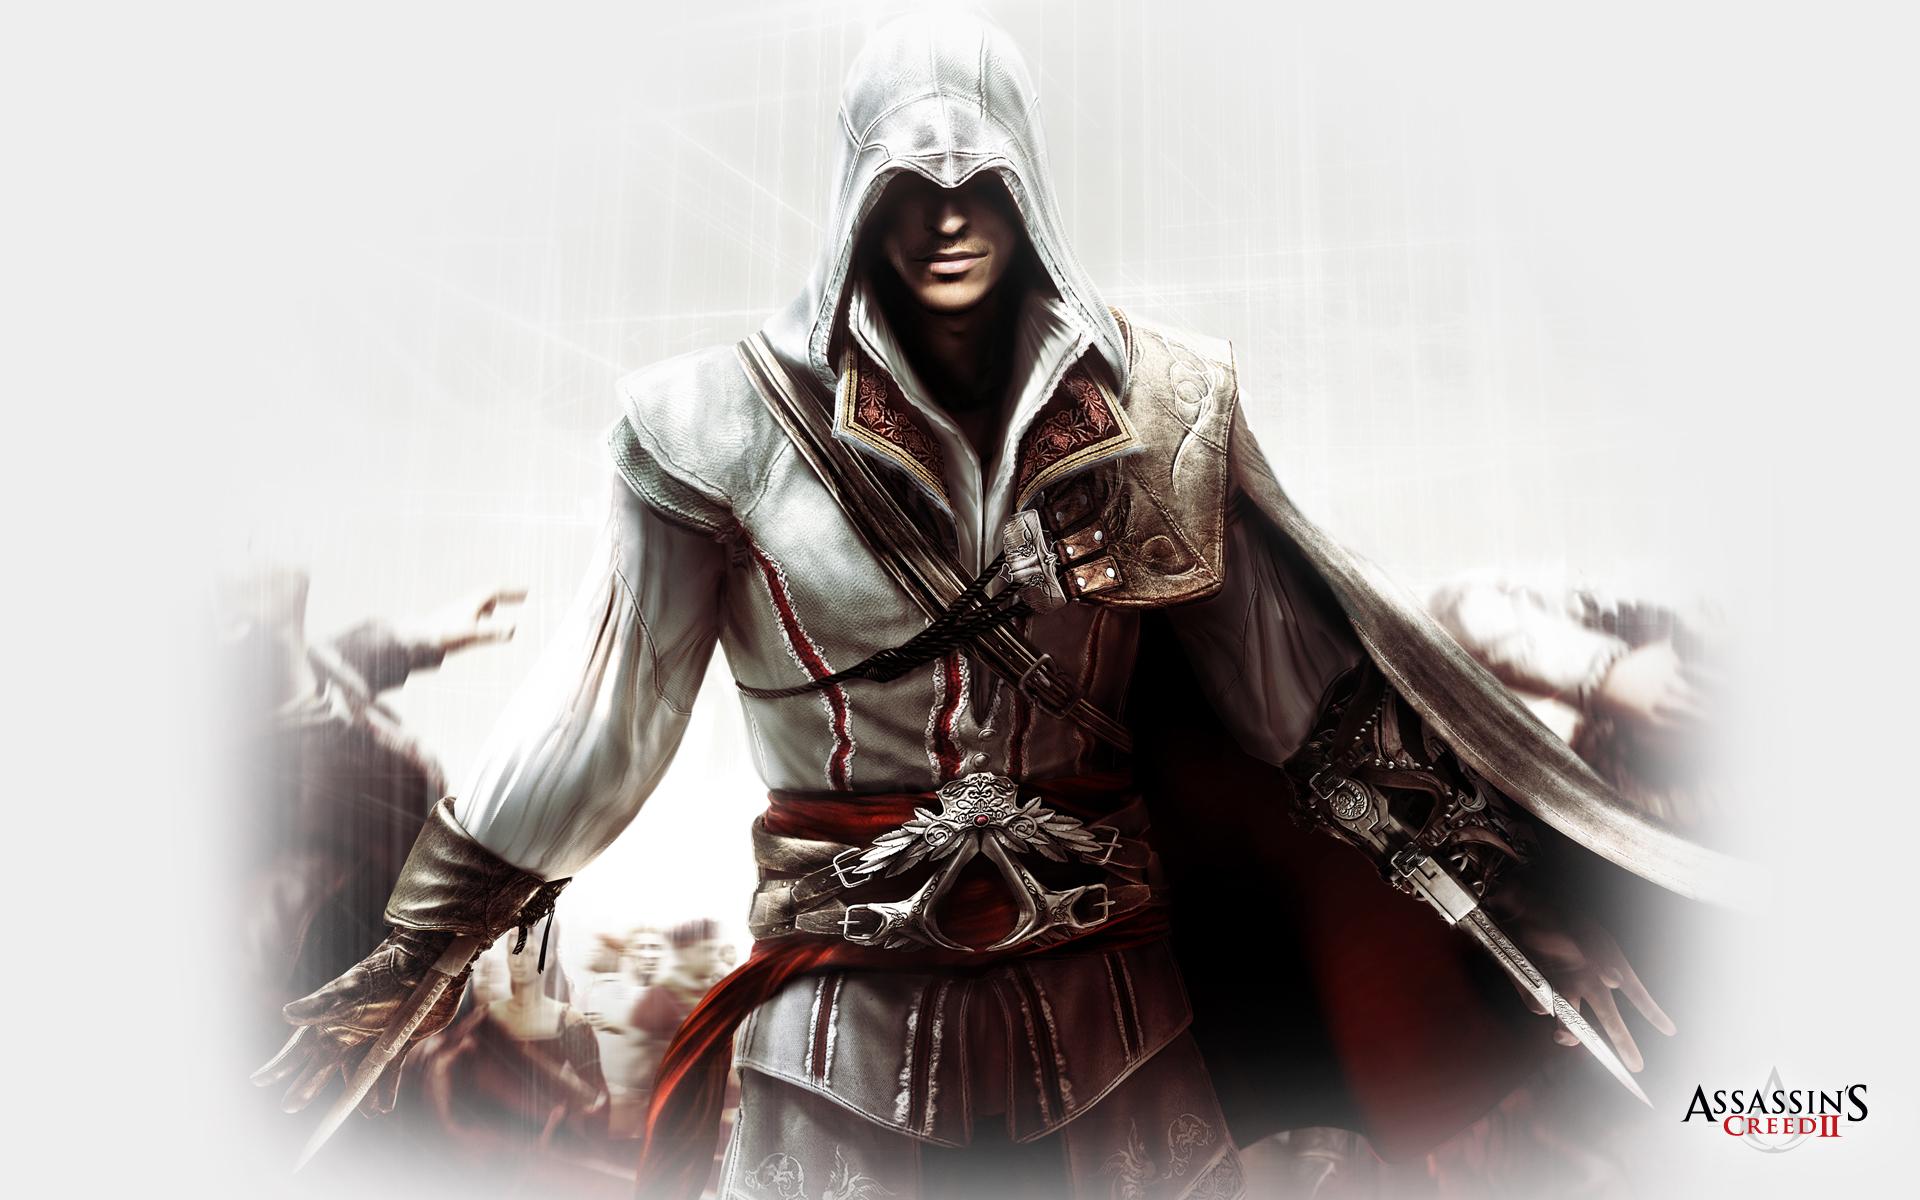 Assassins Creed Brotherhood Wallpaper Full Hd 1080p Picture 1920x1200